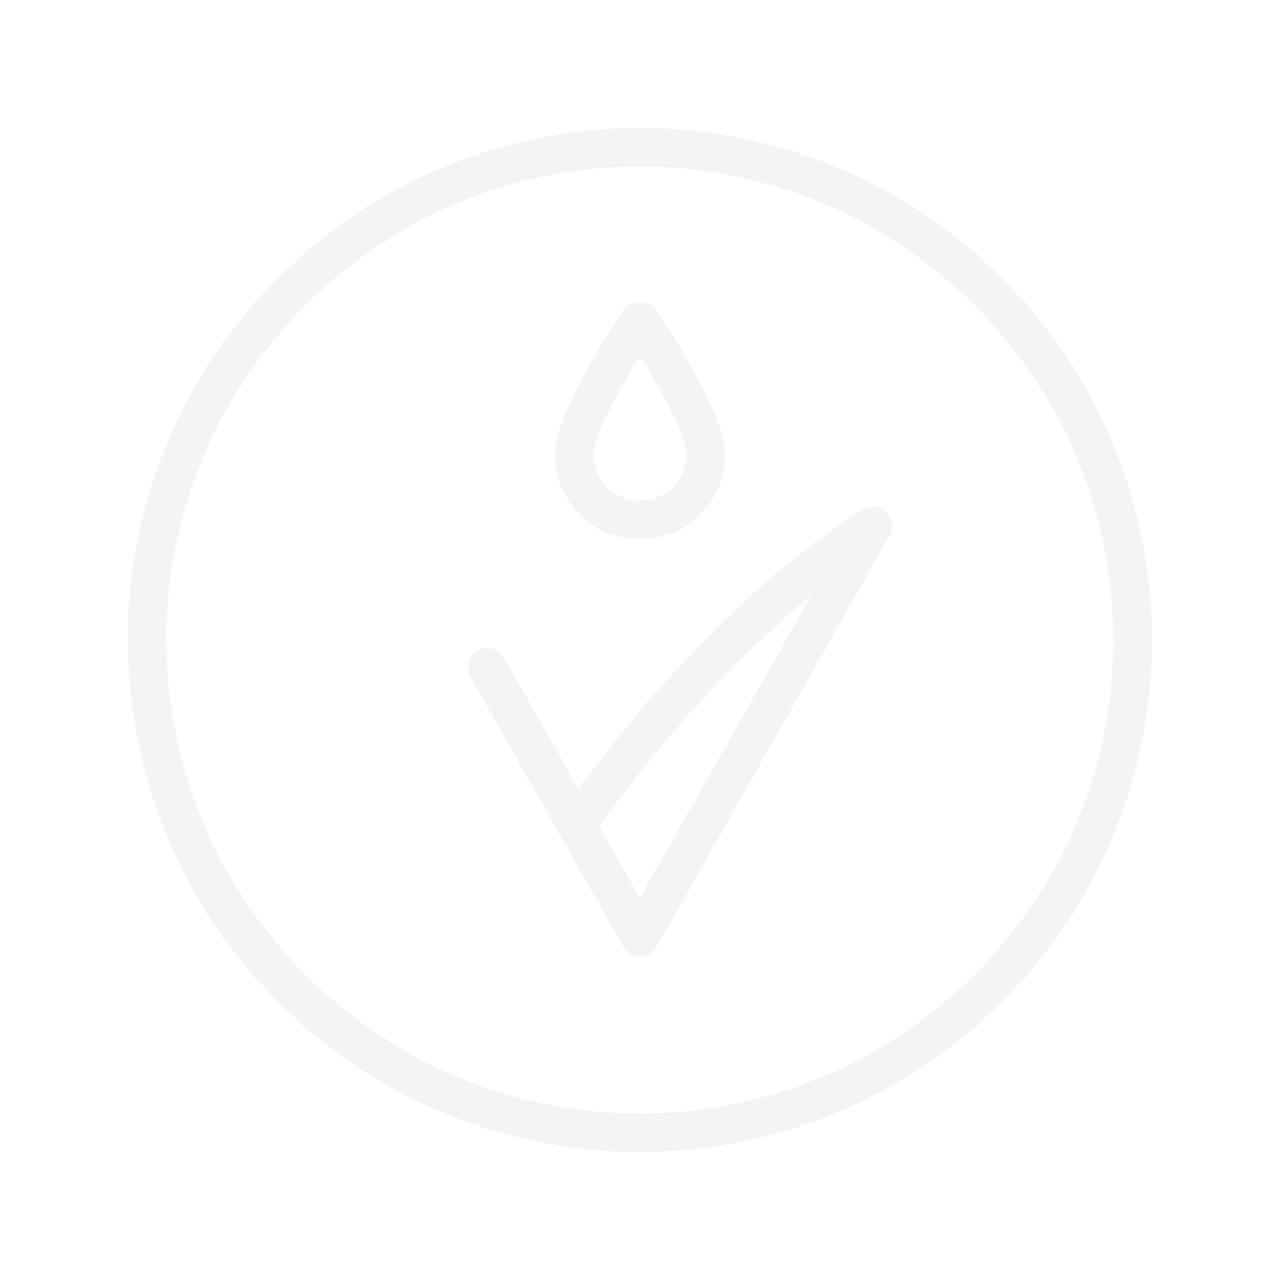 LA ROCHE-POSAY Kerium Extra Gentle Physiological Gel-Shampoo физиологический гель-шампунь 400ml